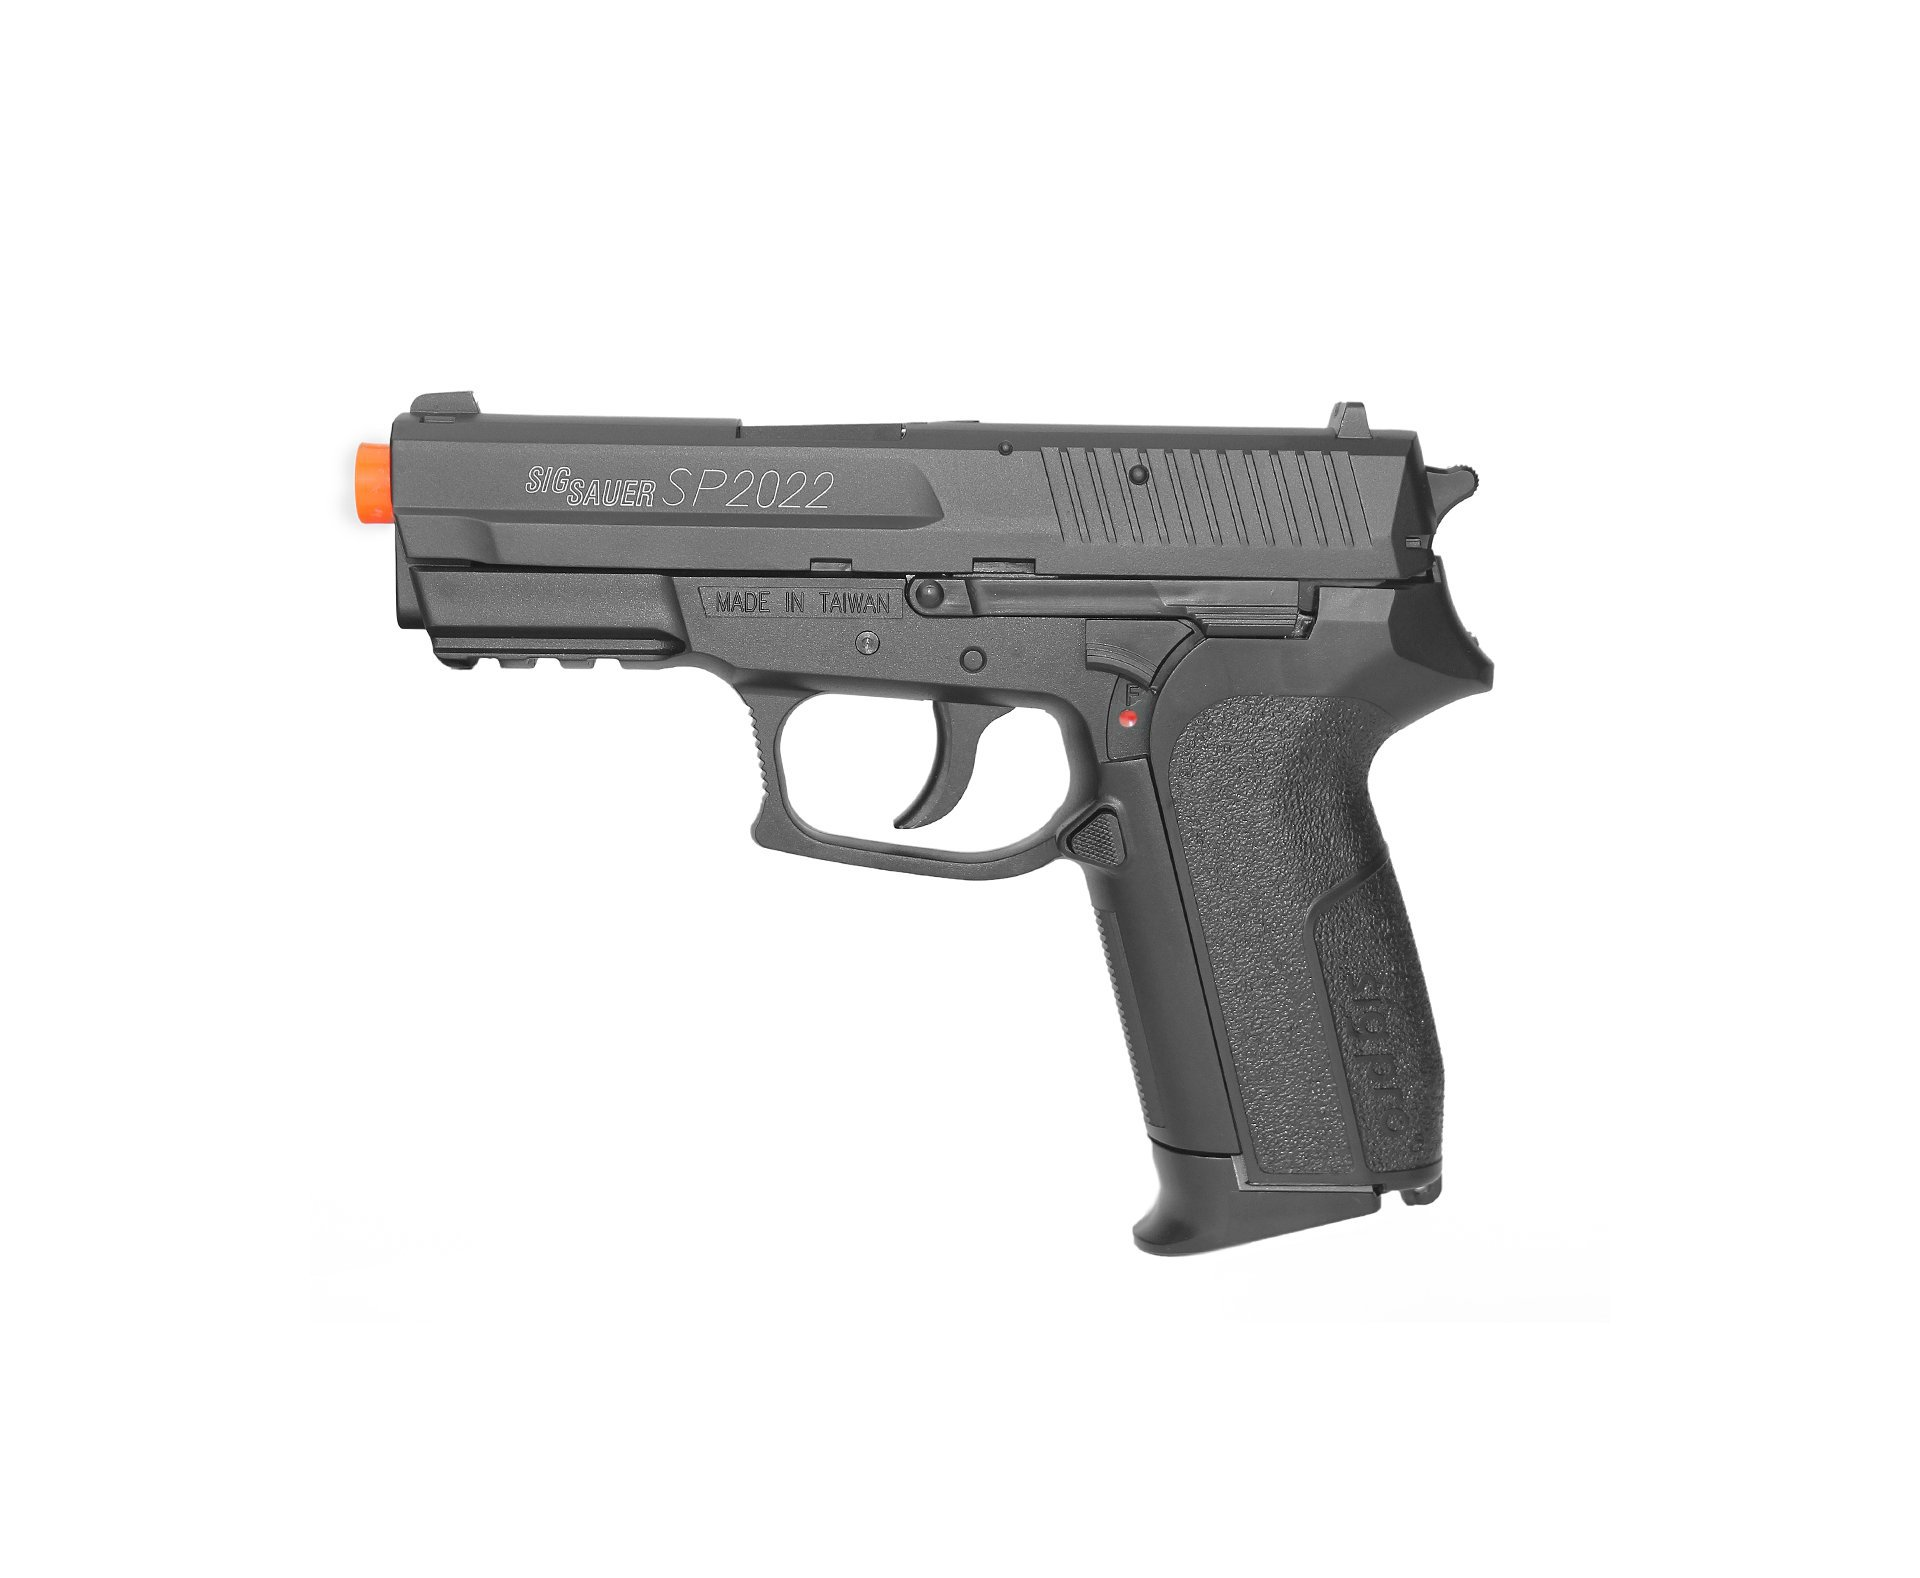 Pistola De Airsoft Gas Co2 Sig Sauer Sp2022 Slide De Metal Cal 6mm